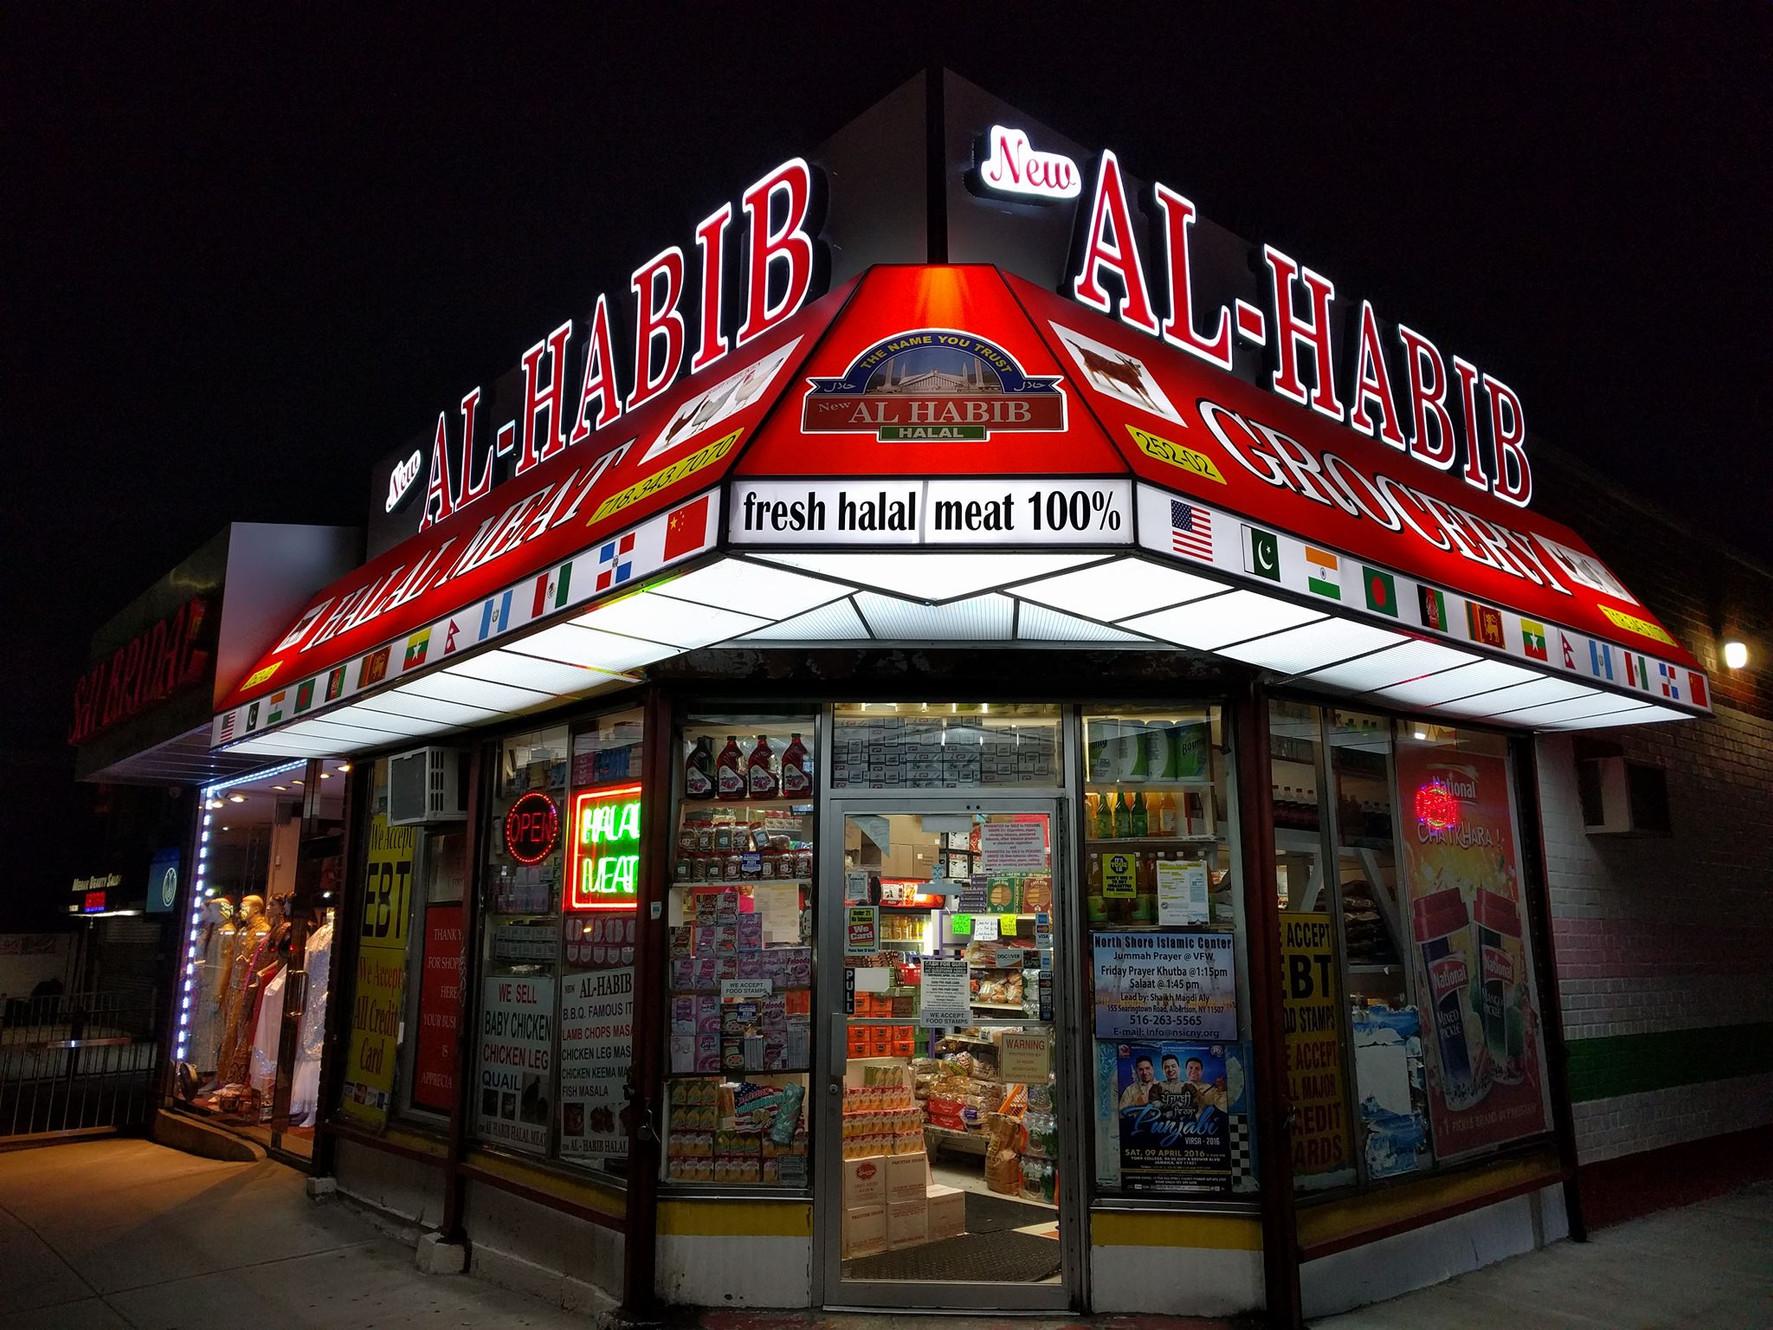 Al Habib - Halal Pakistani & Indian Meat & Fish Market